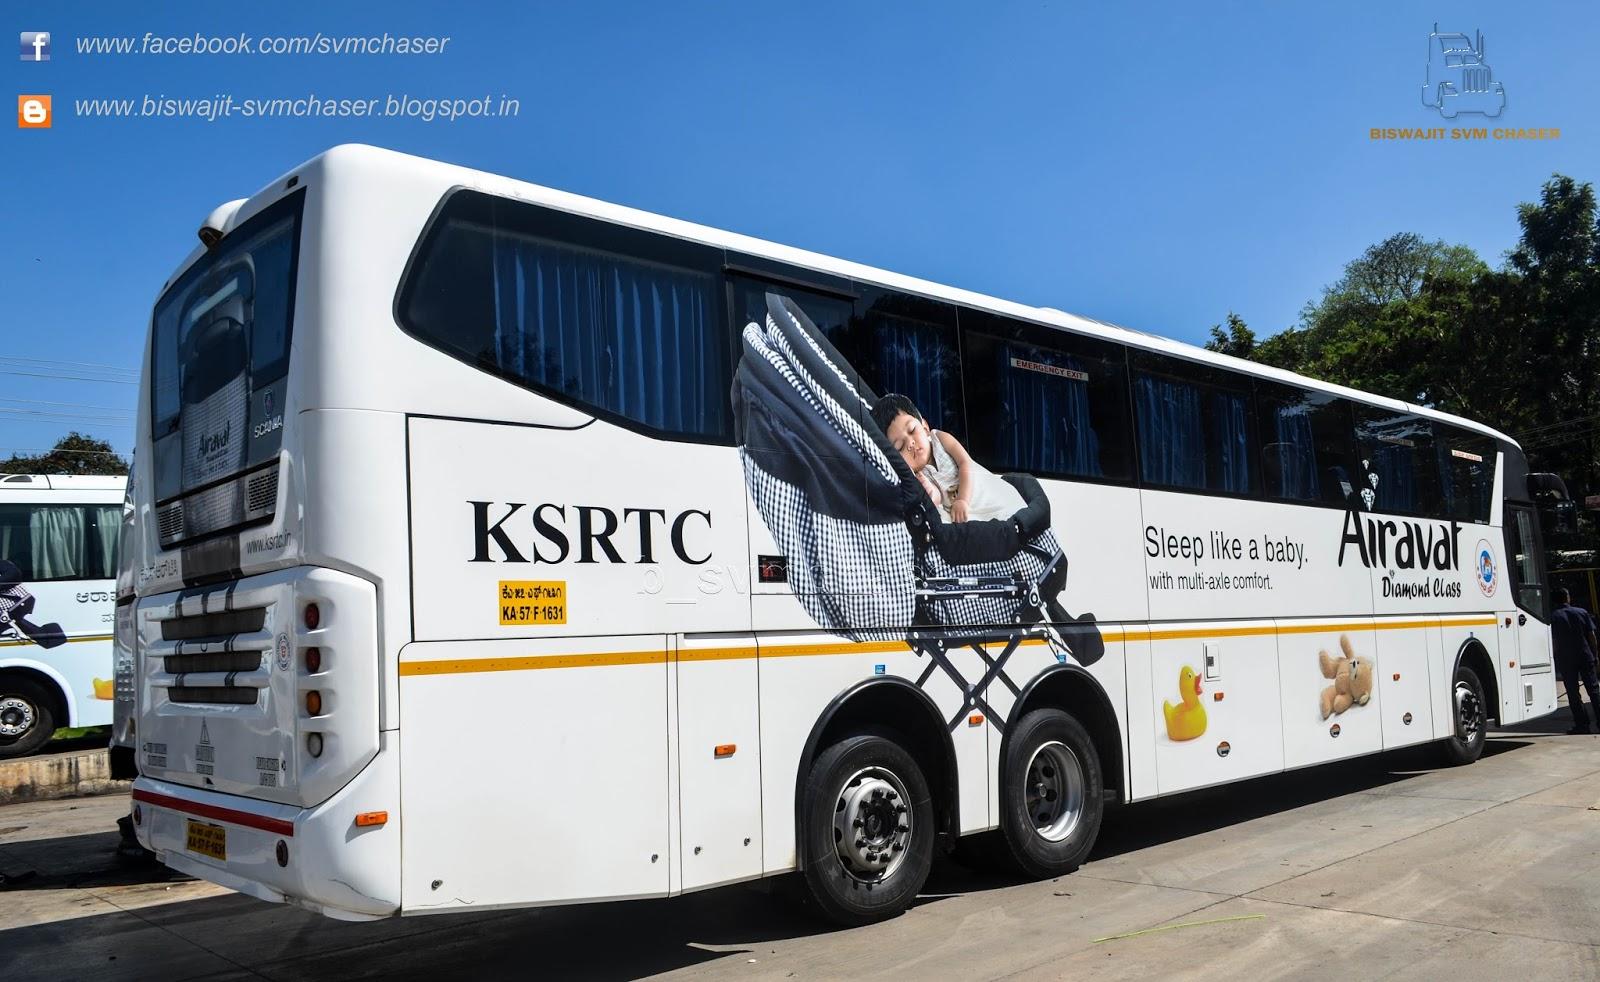 Ksrtc Airavat Diamond Class Scania Metrolink Hd Ka57 F